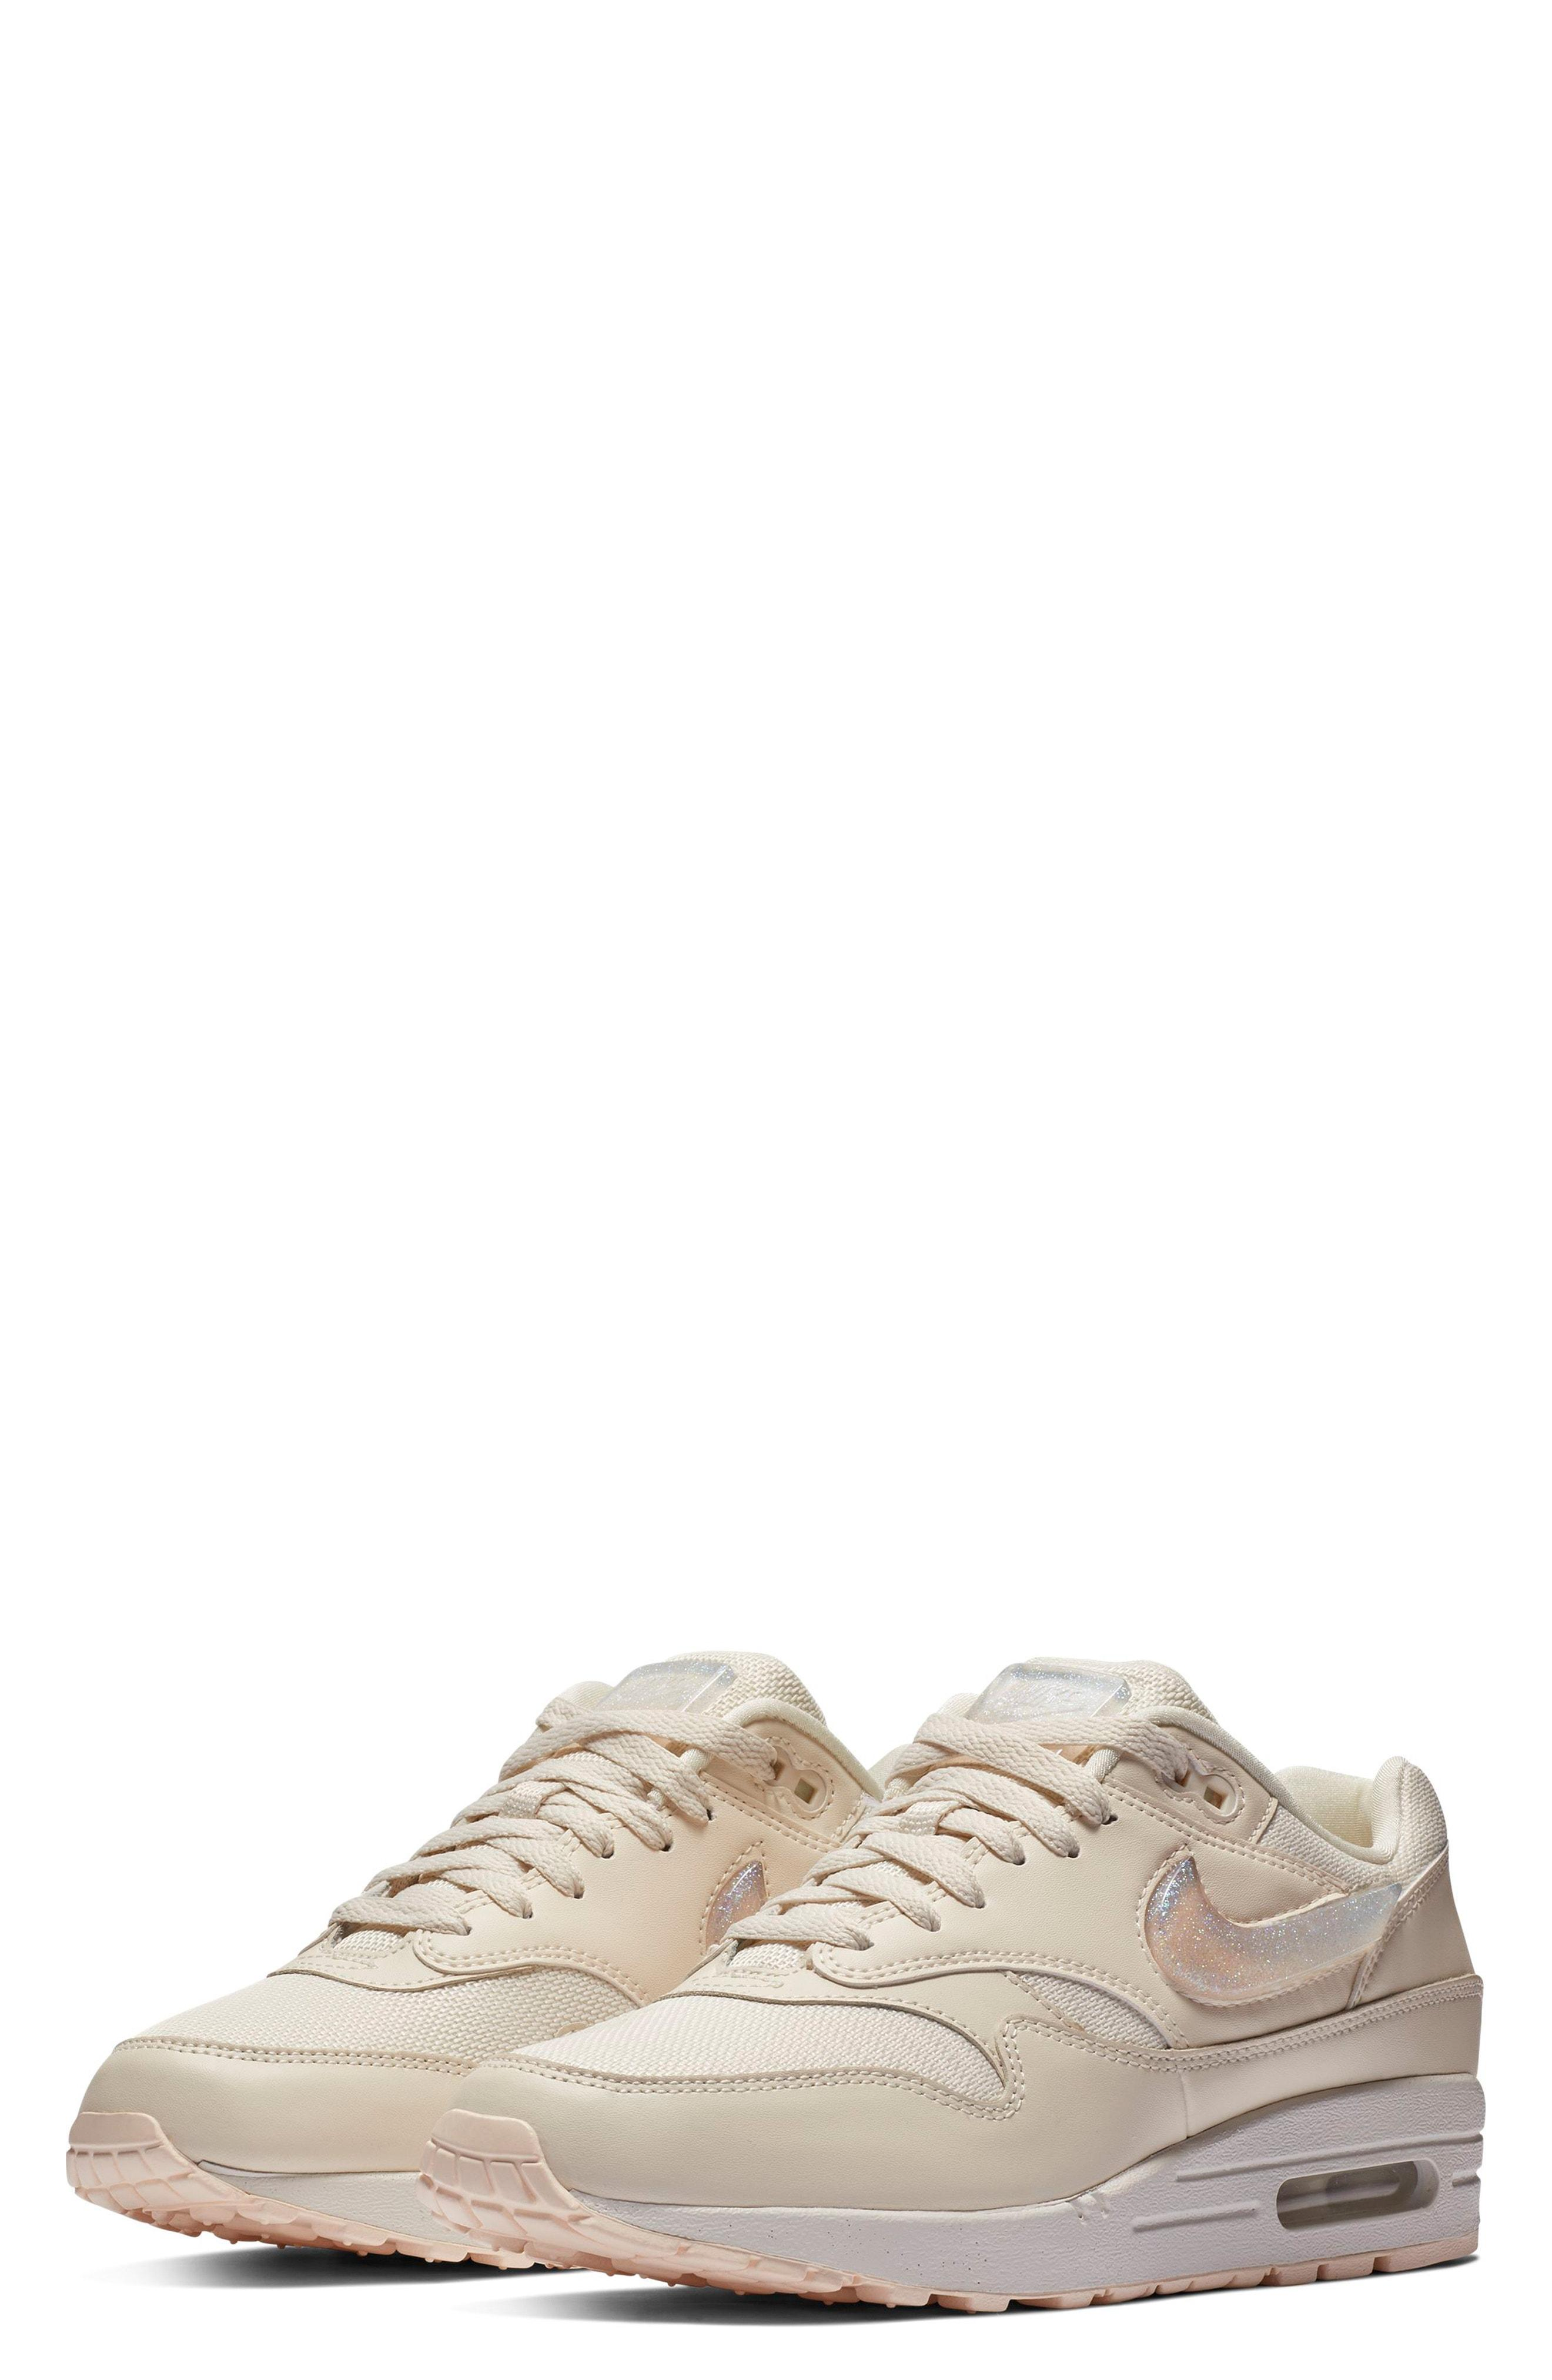 d4979477 Lyst - Nike Air Max 1 Jp Sneaker in White